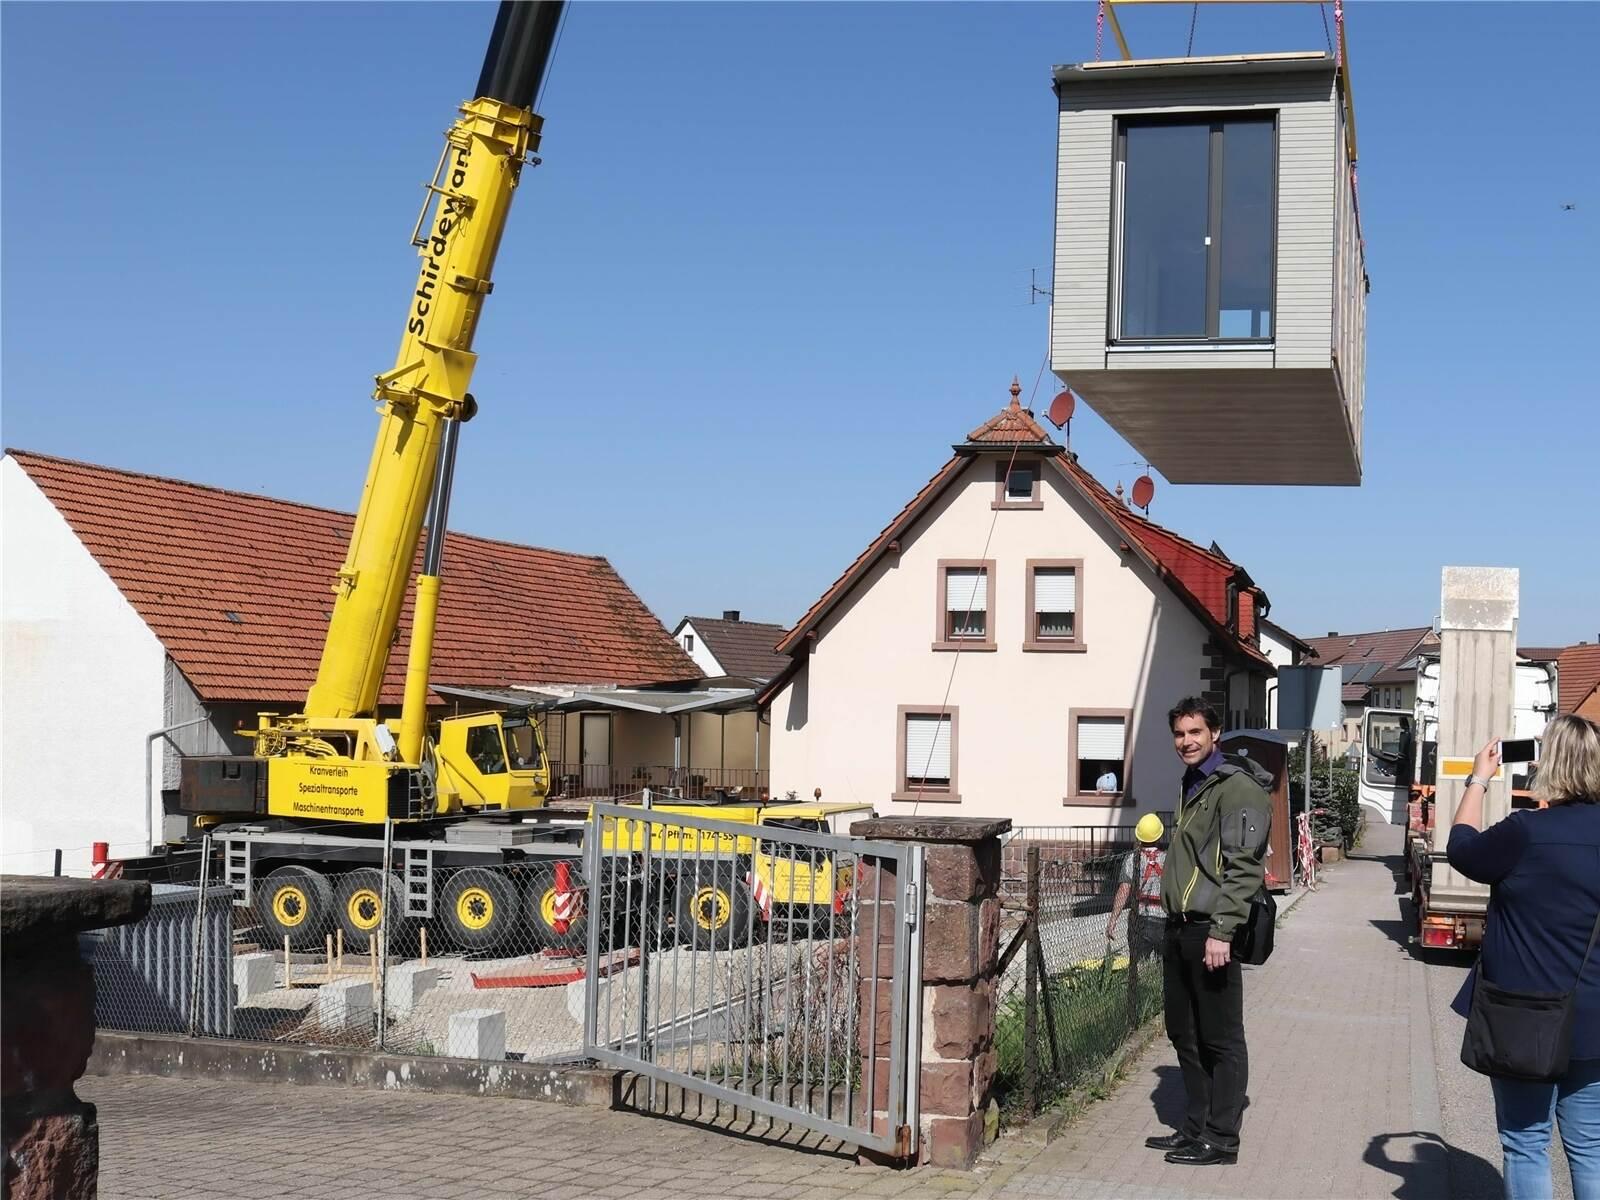 Schwalbenhof Neusatz